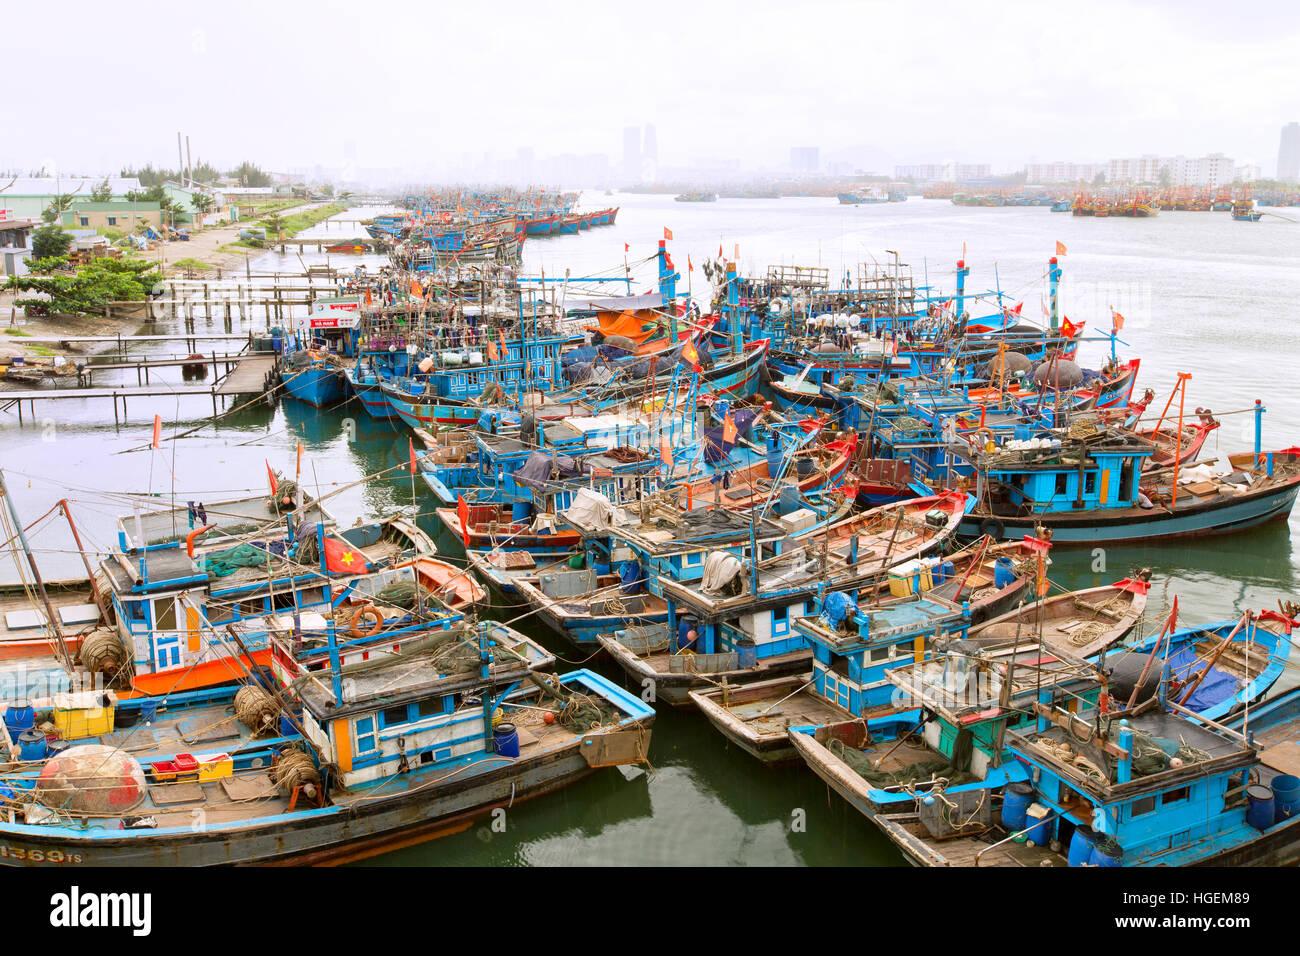 Anchored fishing boats, prediction of oncoming typhoon. - Stock Image